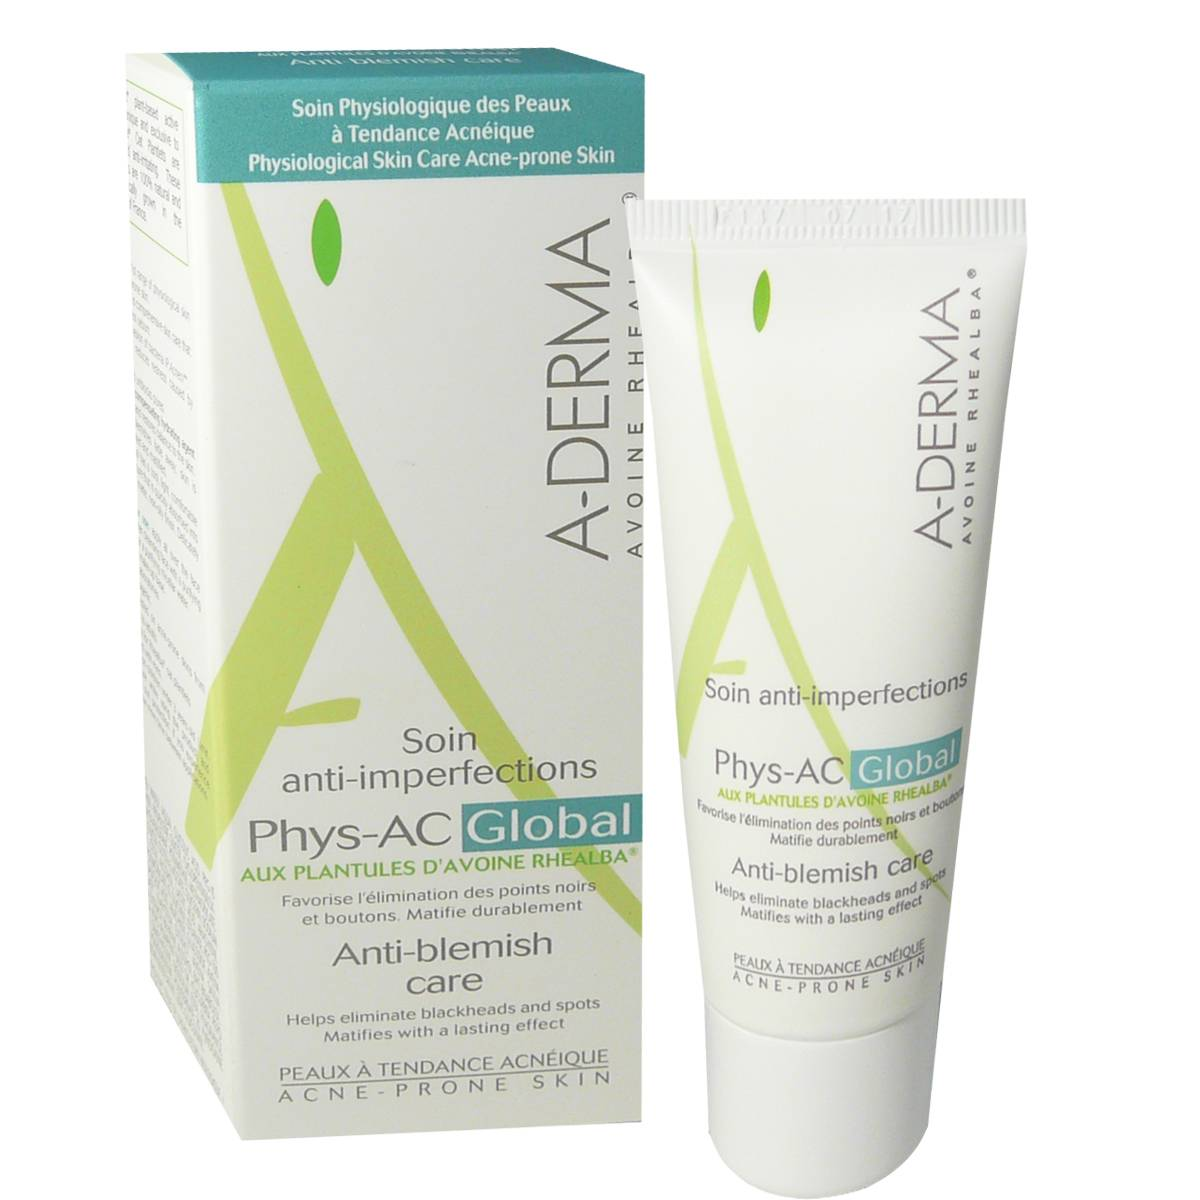 A DERMA Aderma soin anti-imperfections phys-ac aux plantules d'avoine 40 ml